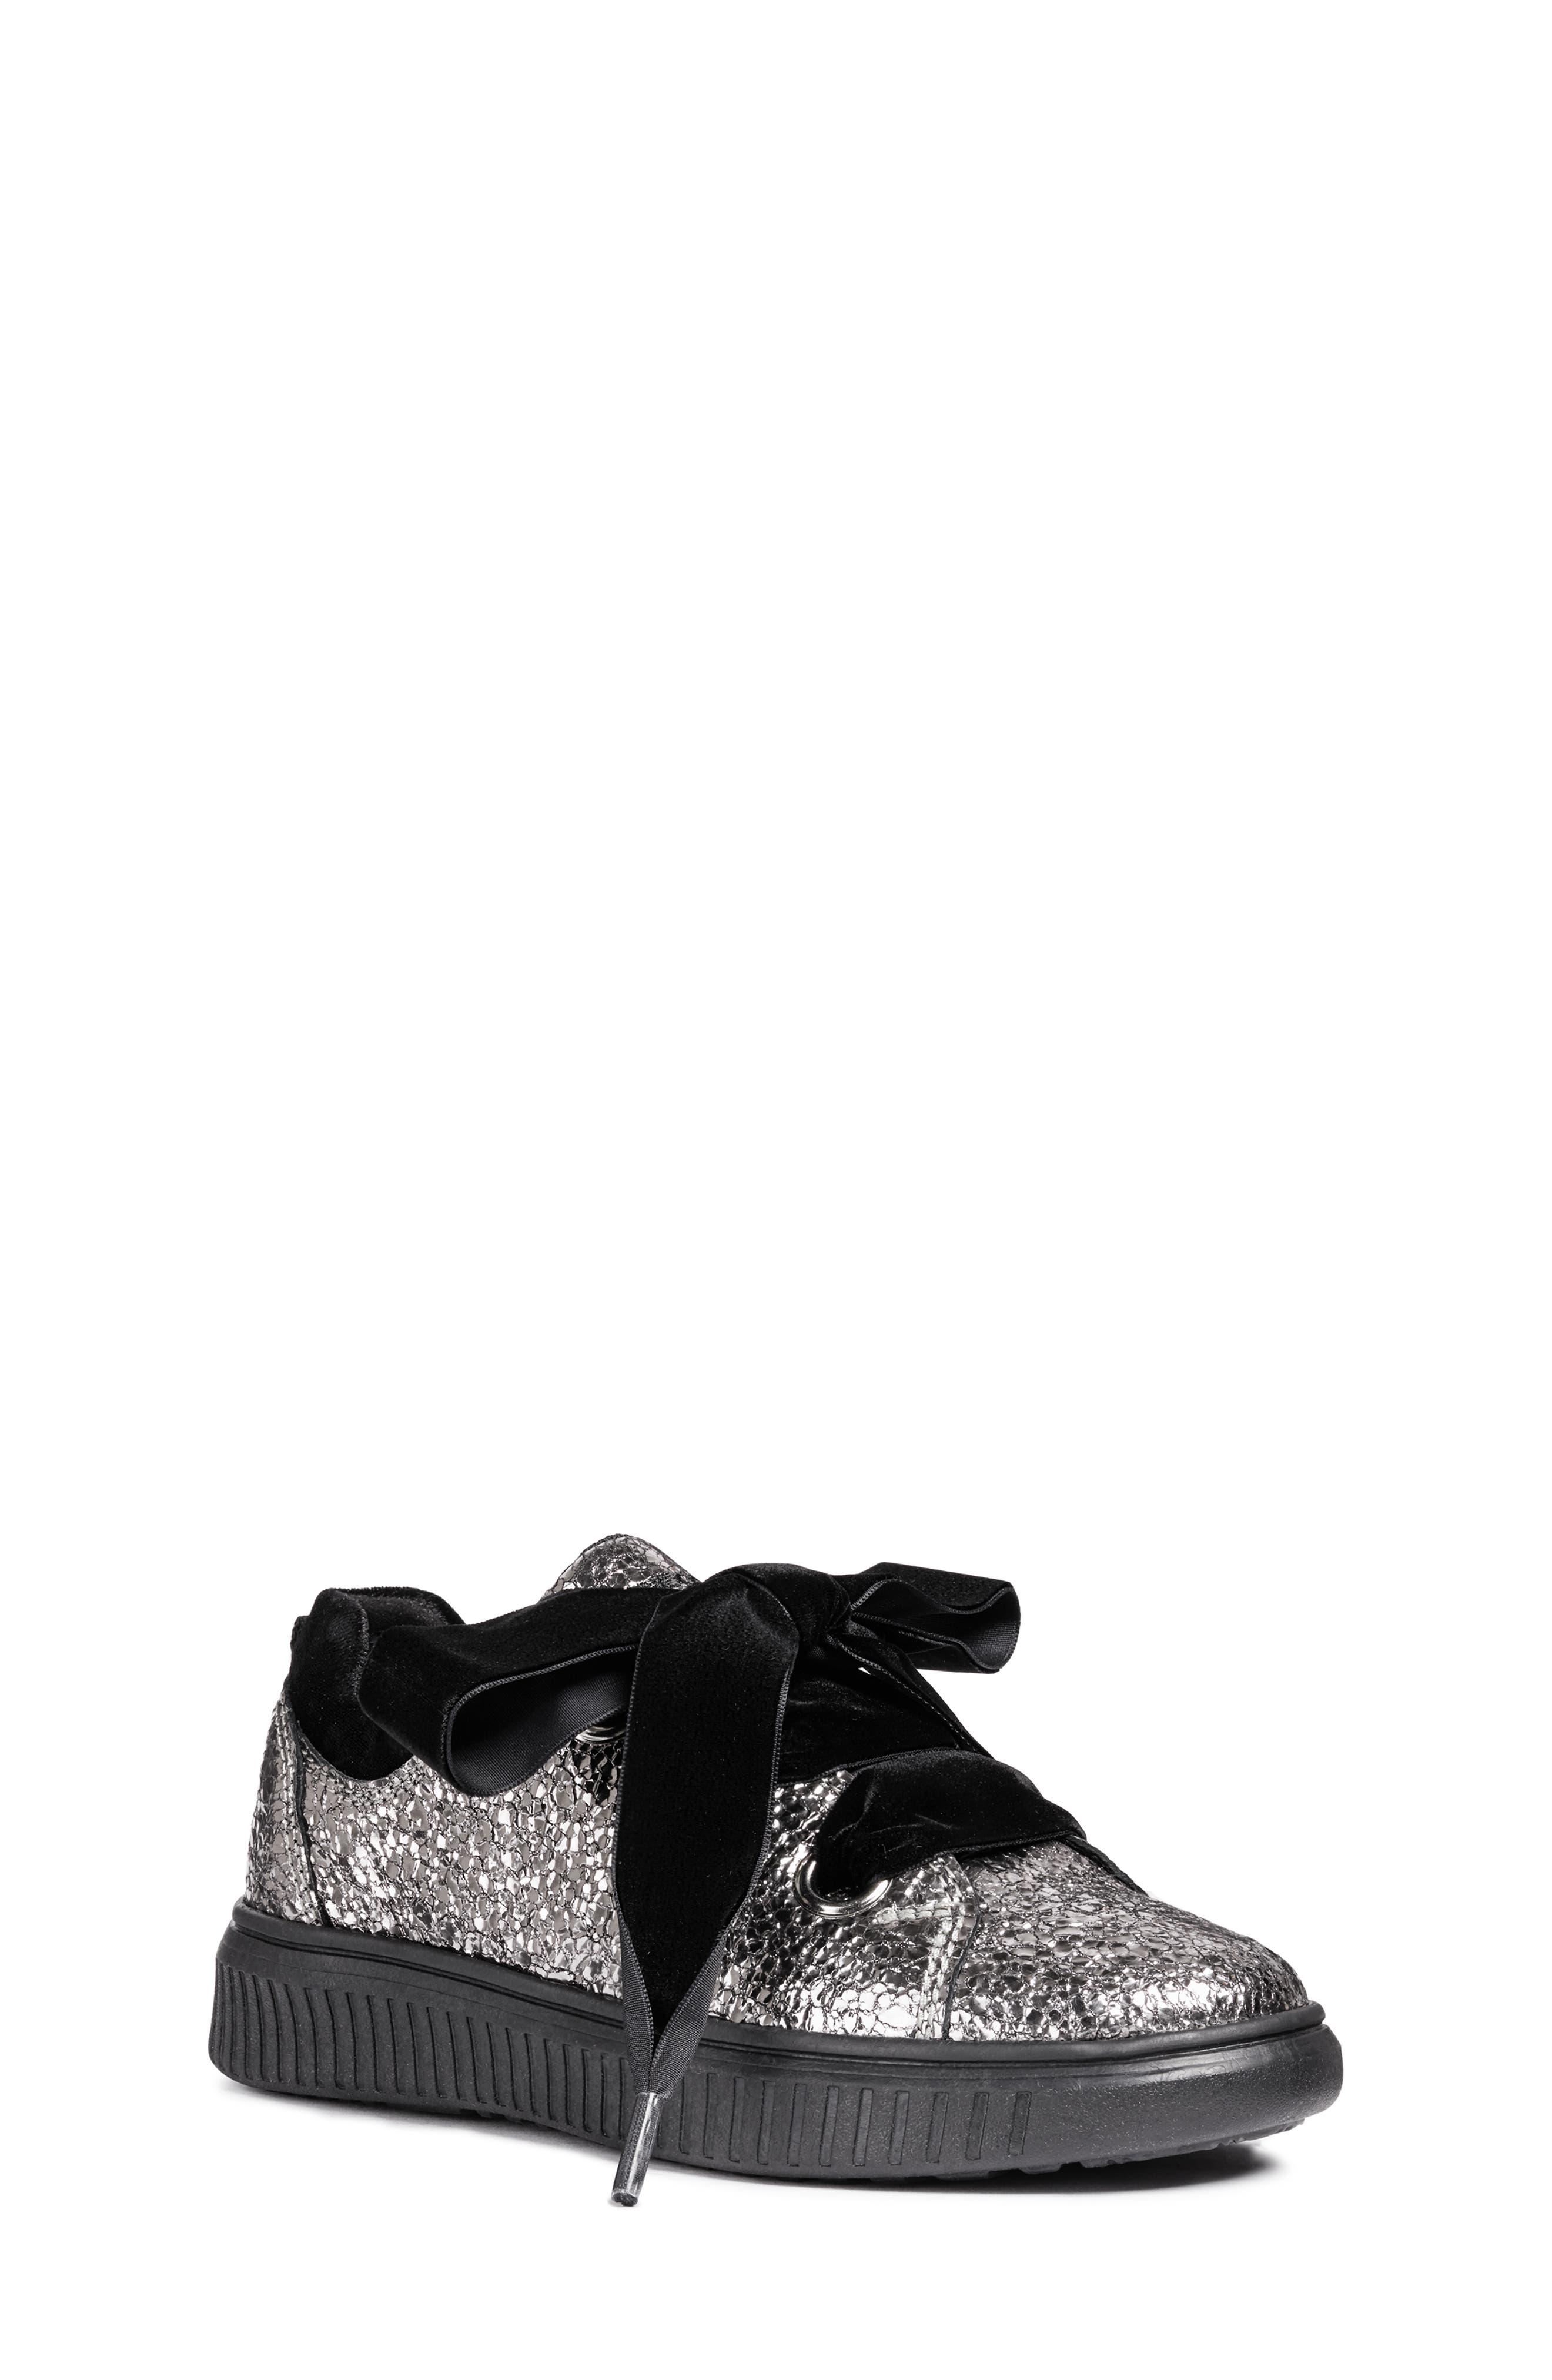 Disco Mix Sneaker,                             Main thumbnail 1, color,                             DARK SILVER